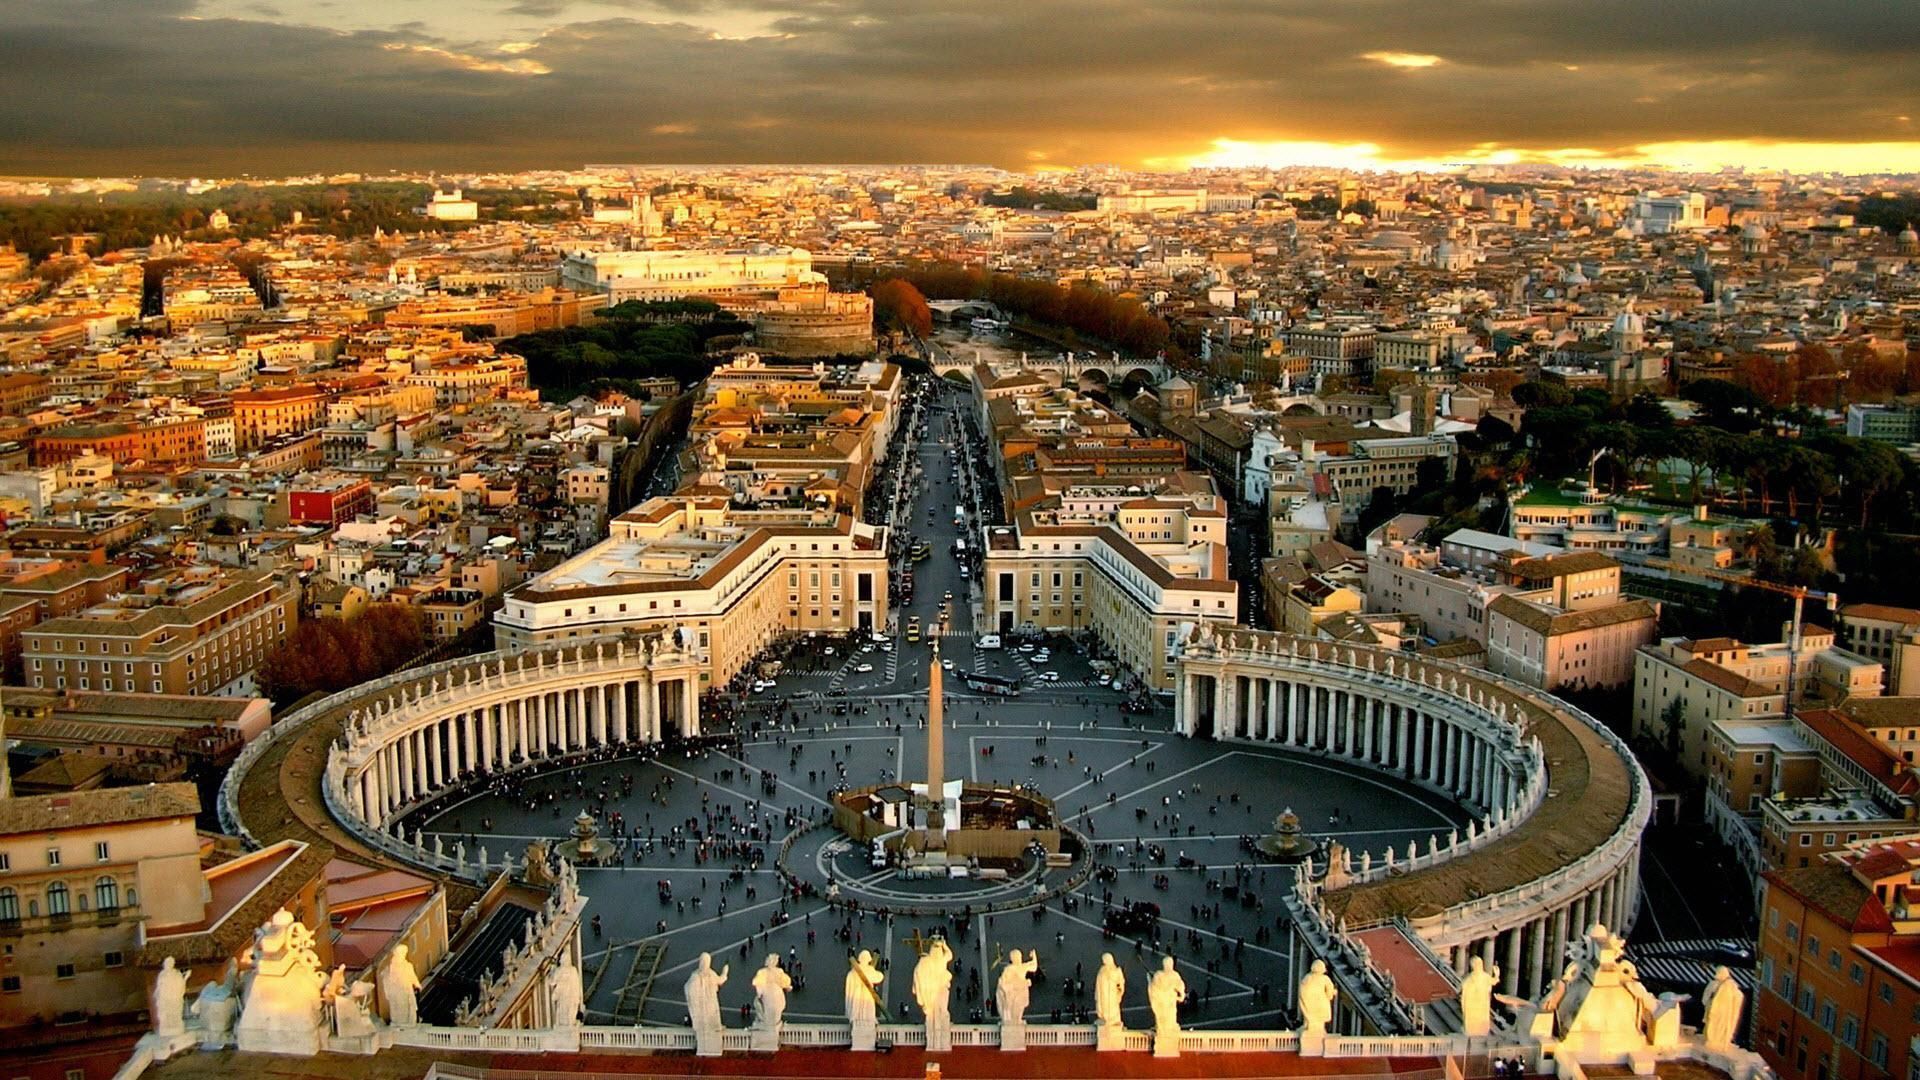 vatican wallpapers travel world - photo #3